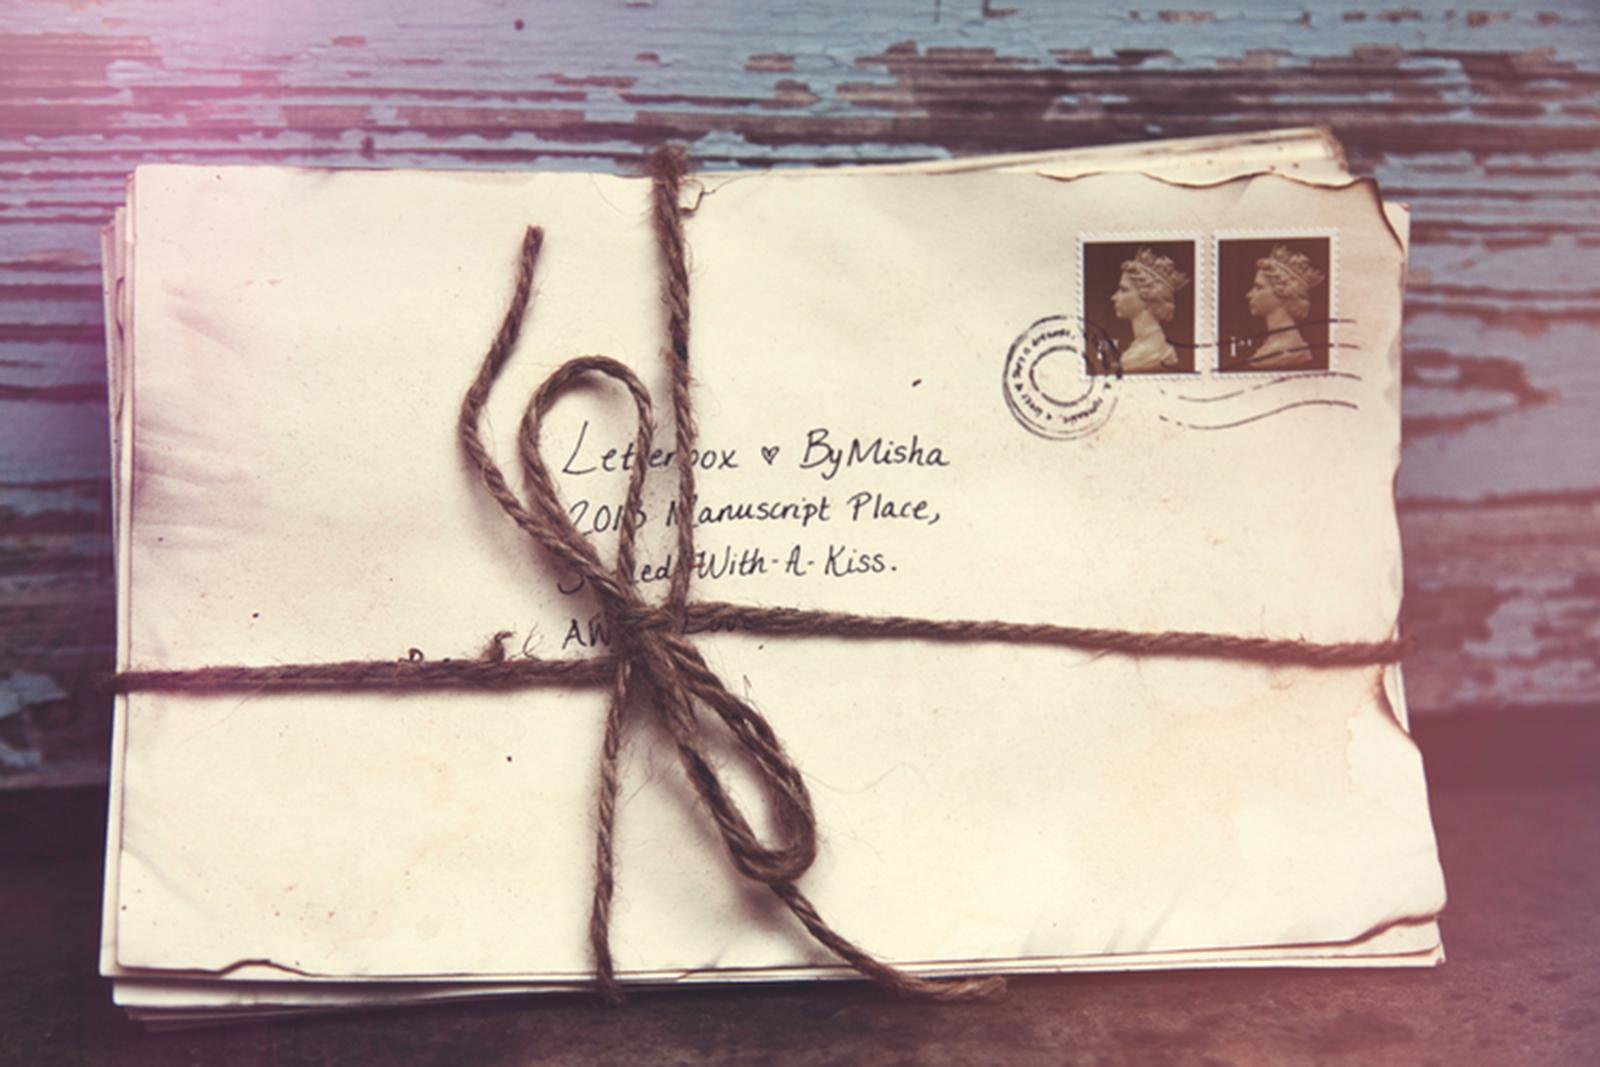 Evie+Lynn_By+Misha_AW13_Letterbox-05.jpg